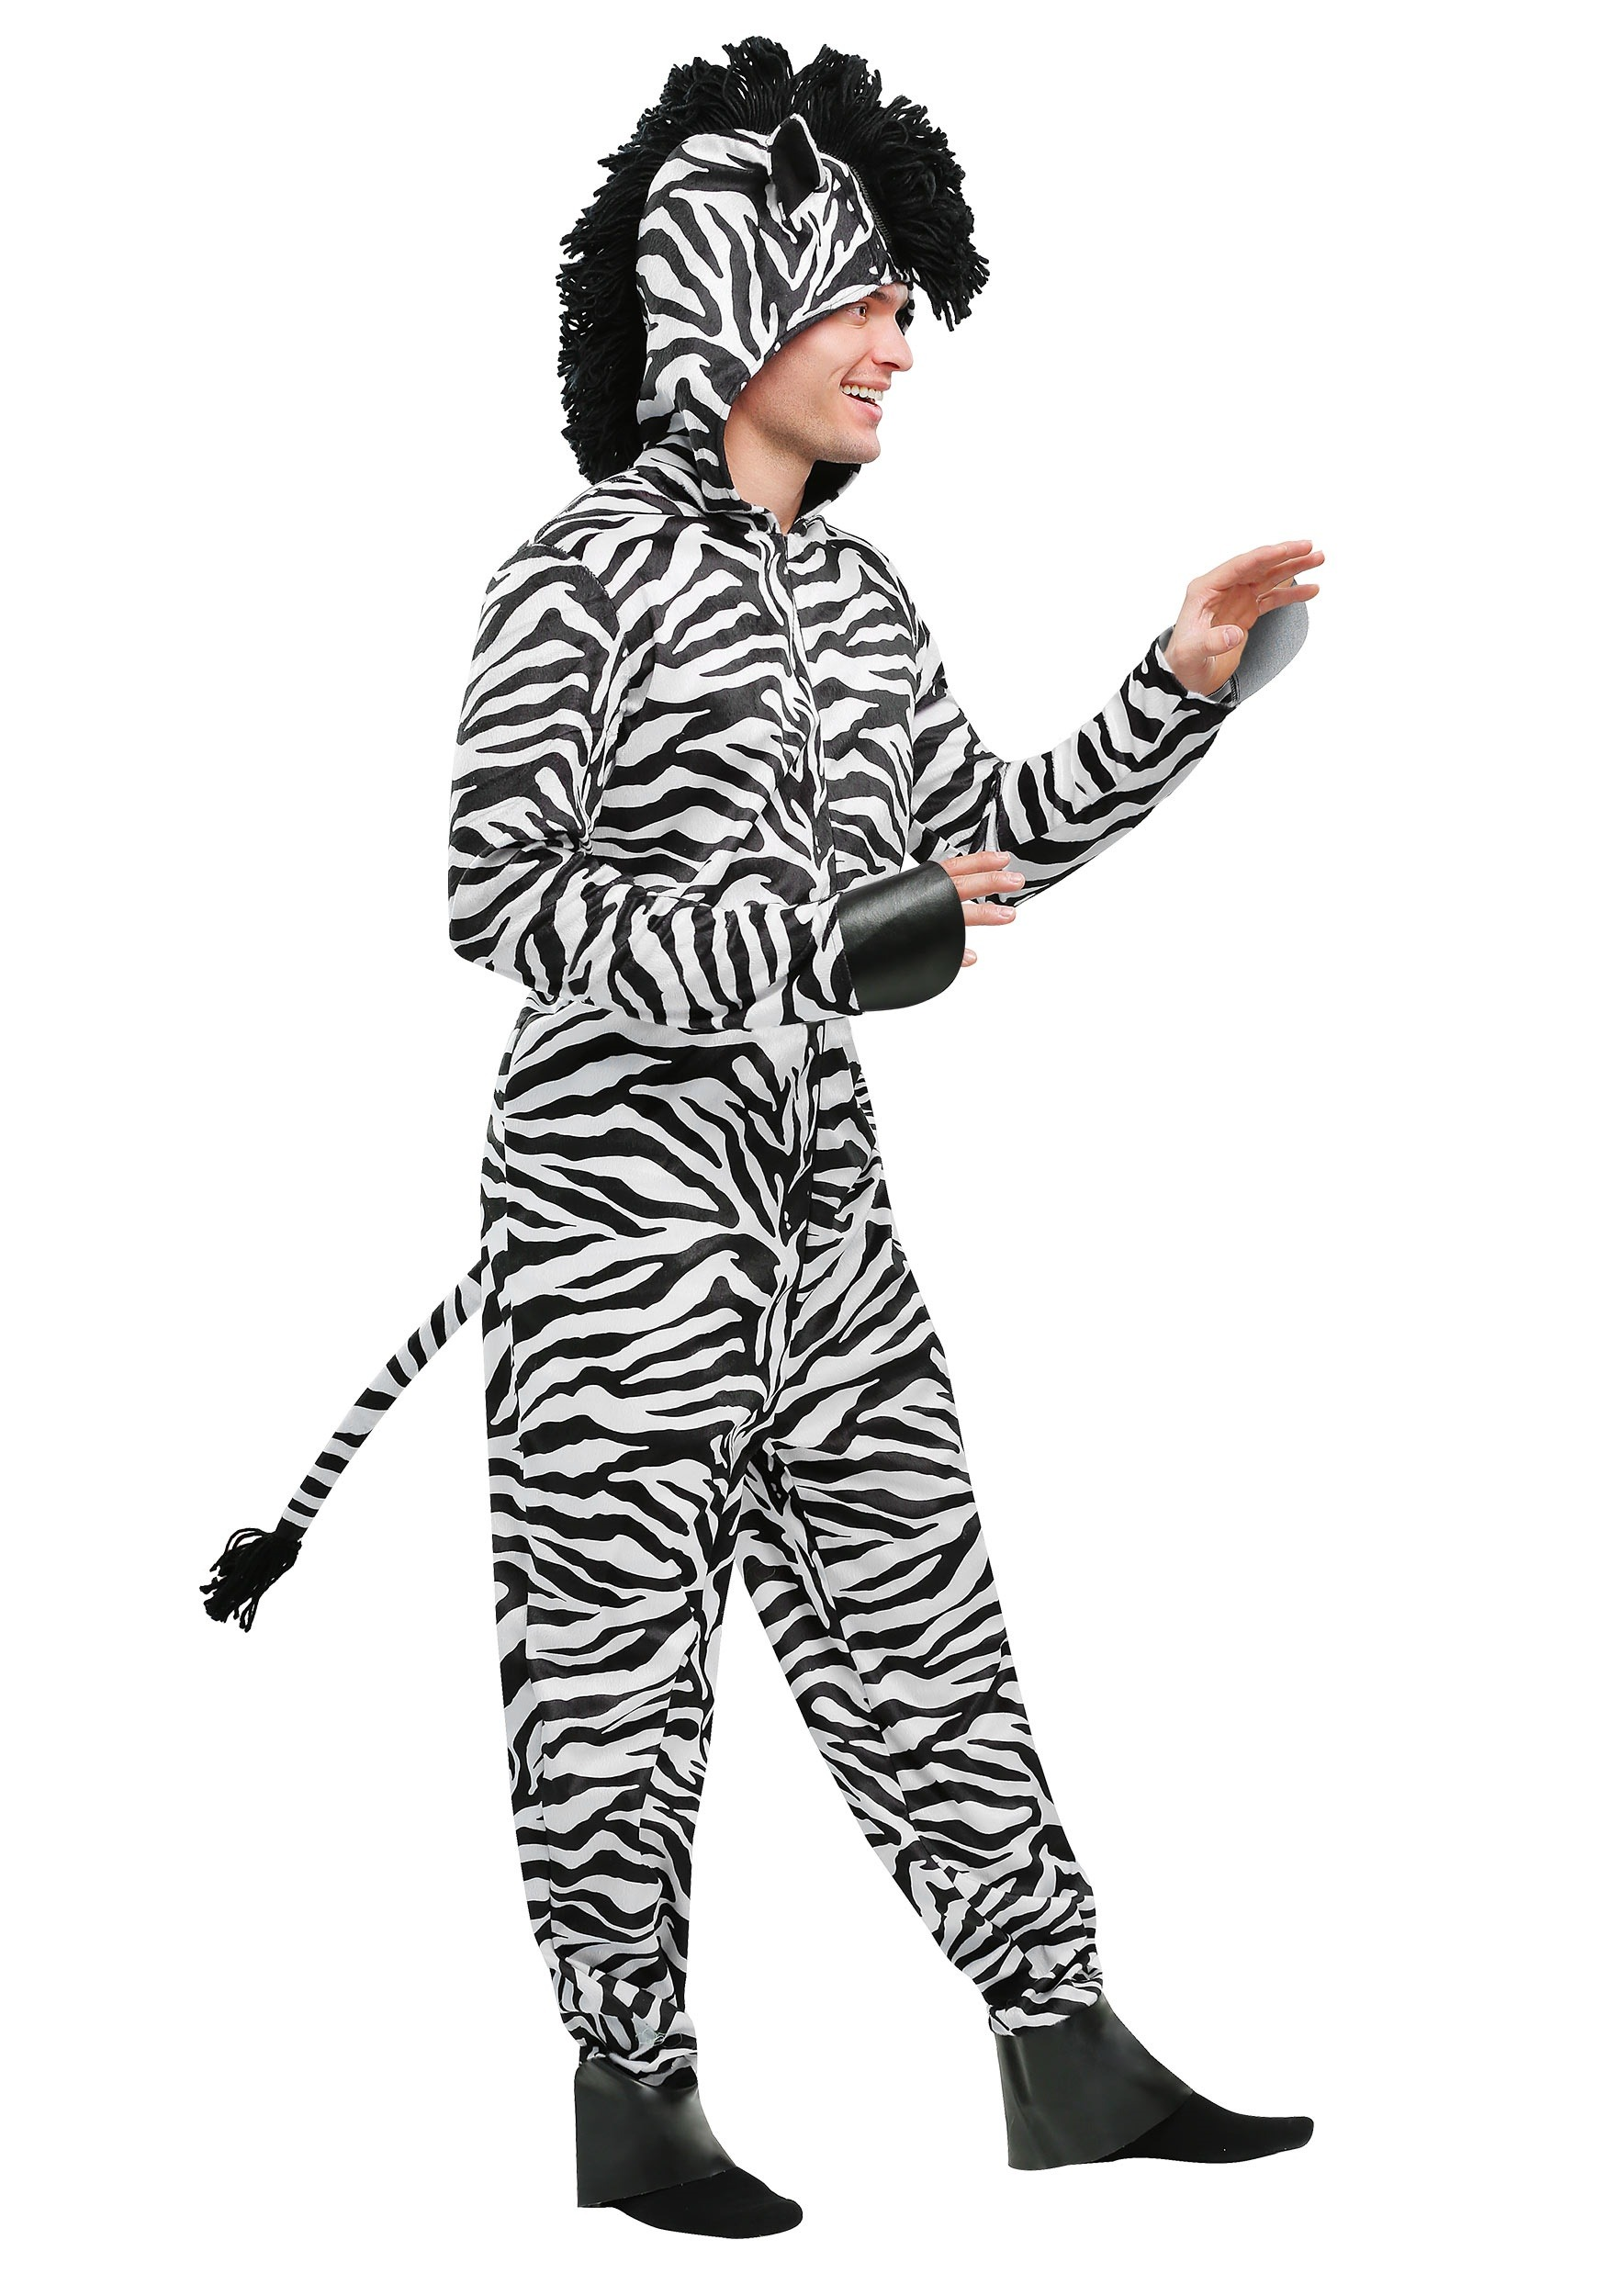 Plus sized adult zebra costume 2x adult plus zebra costume solutioingenieria Gallery